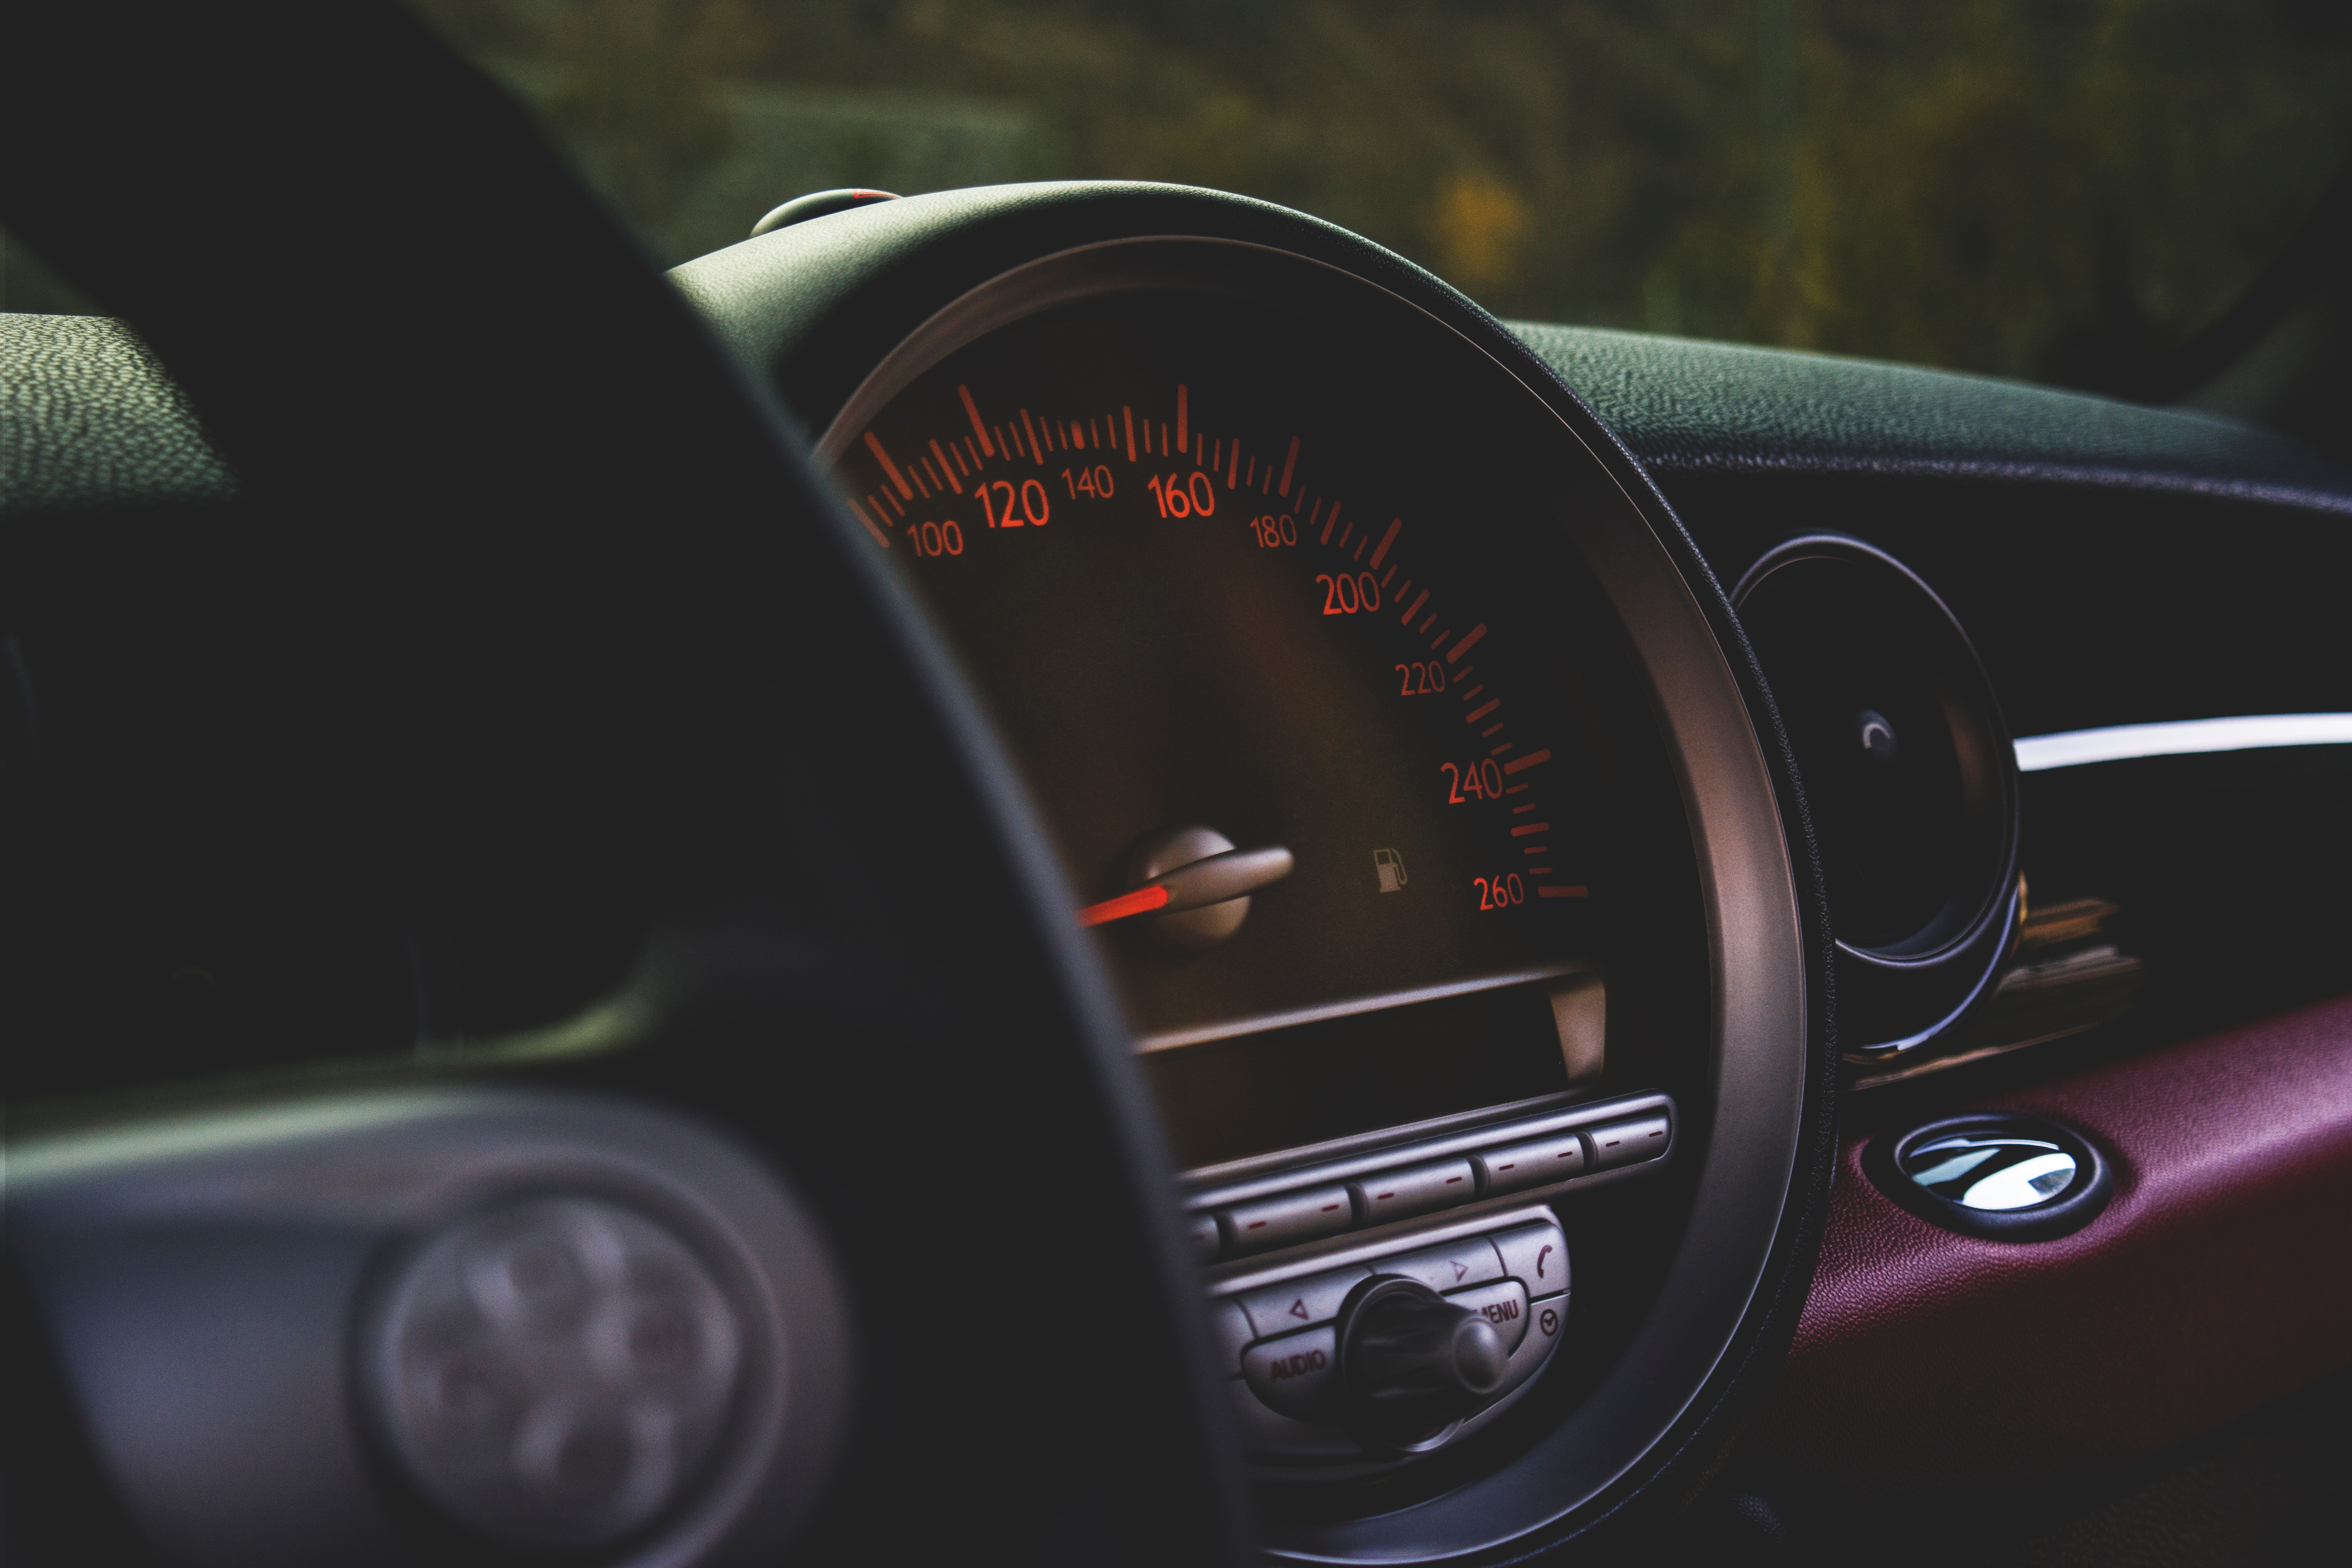 Round Car Speedometer, Road, Power, Odometer, Luxury, HQ Photo